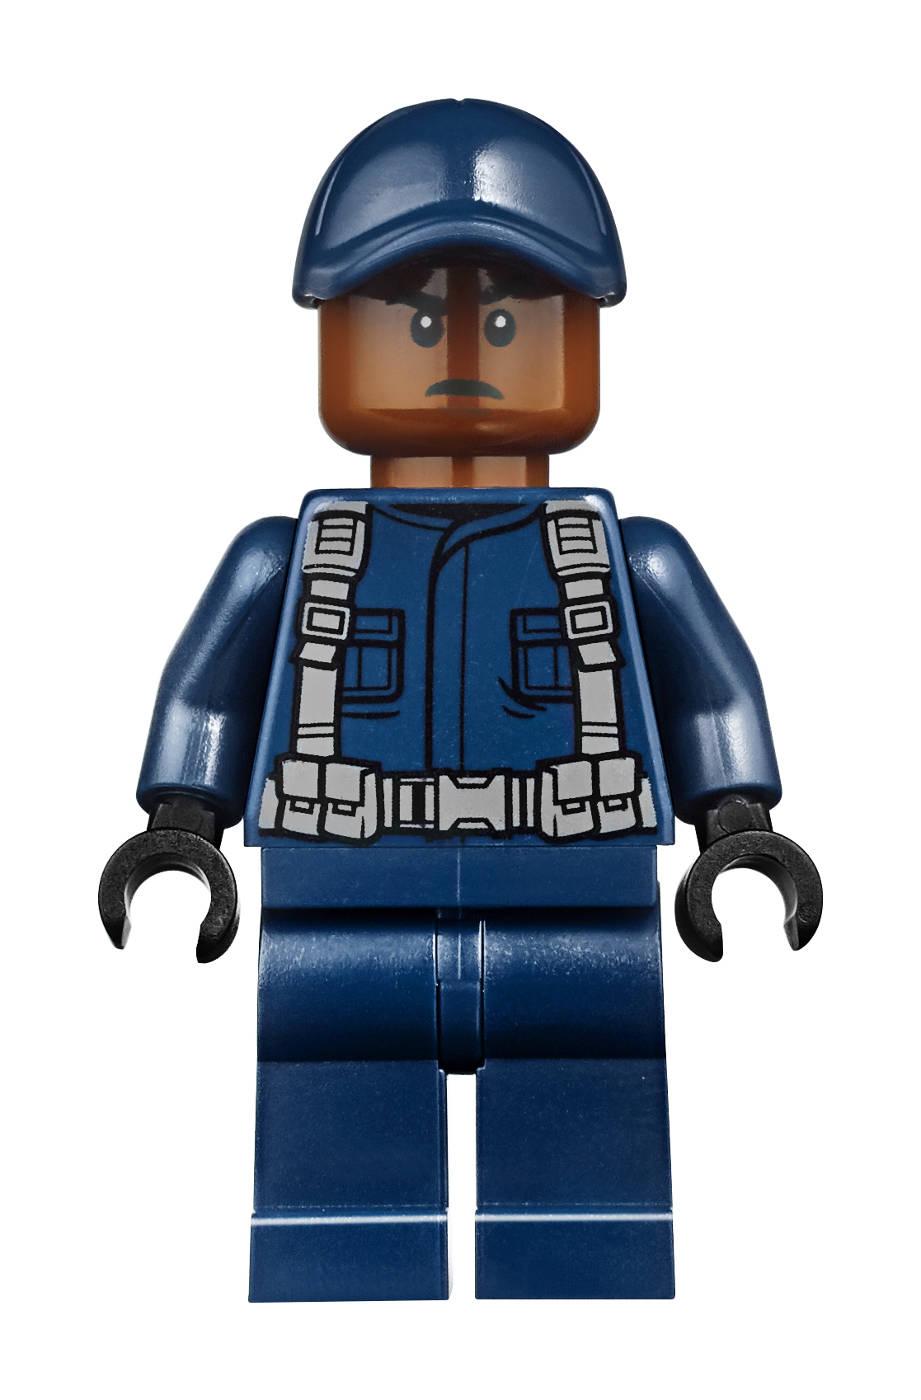 Lego Reveals More Jurassic World Sets Fbtb